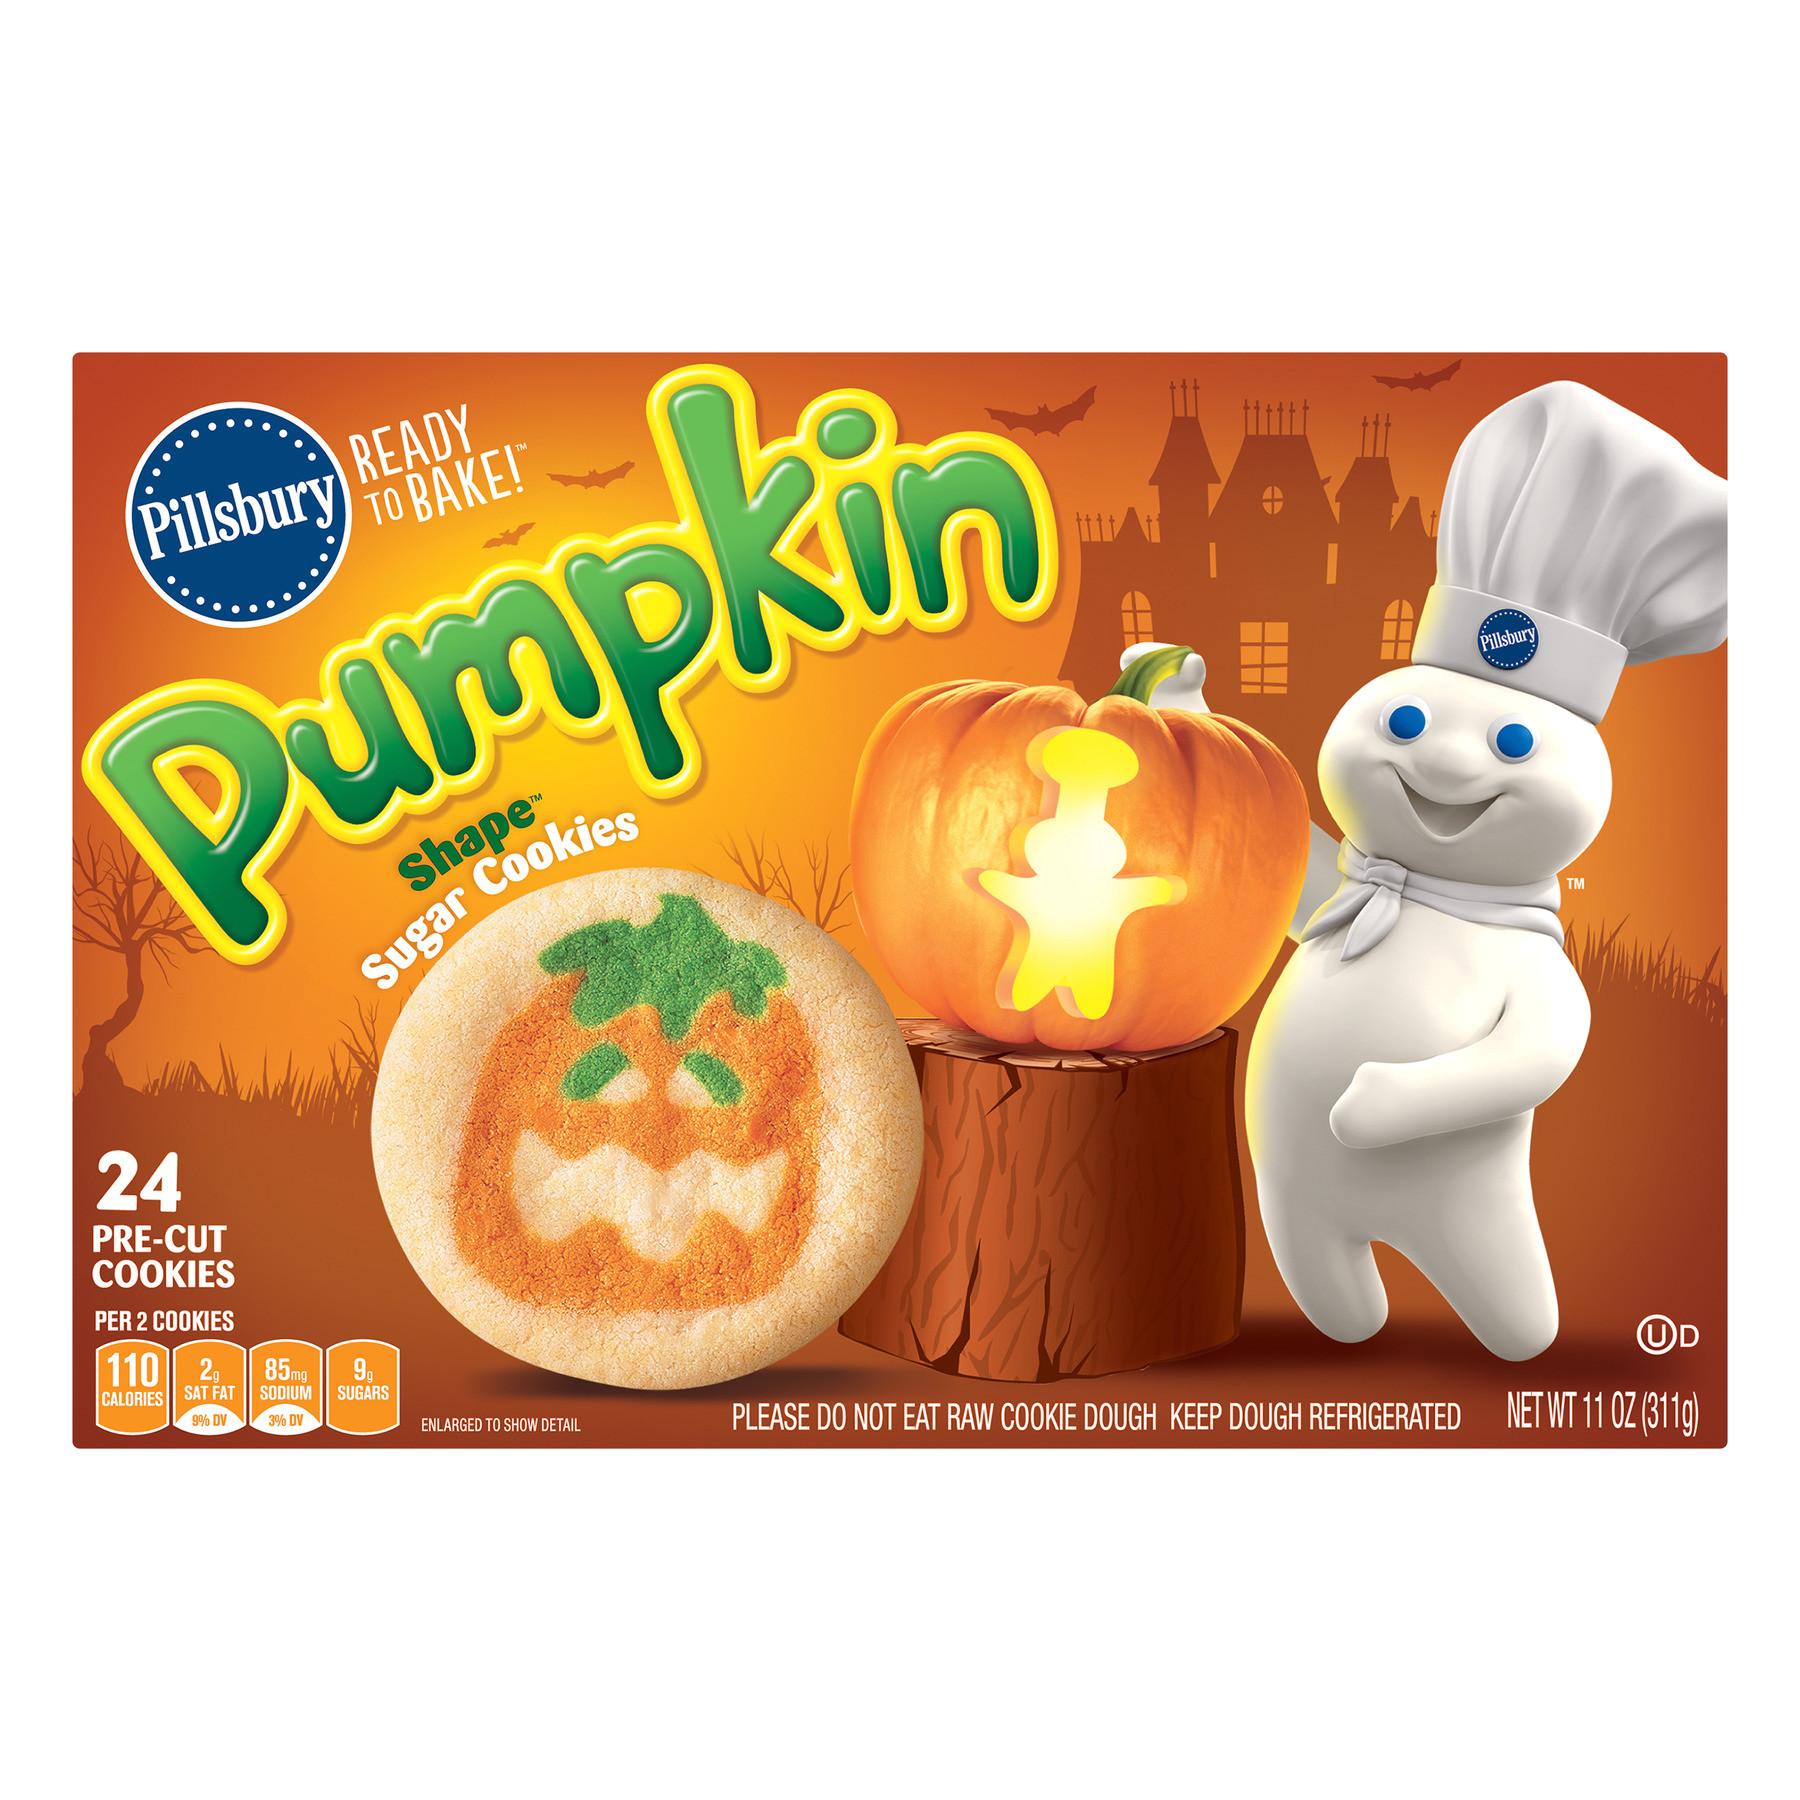 pillsbury ready to bake a pumpkin shapea sugar cookies 11 0 oz walmart com